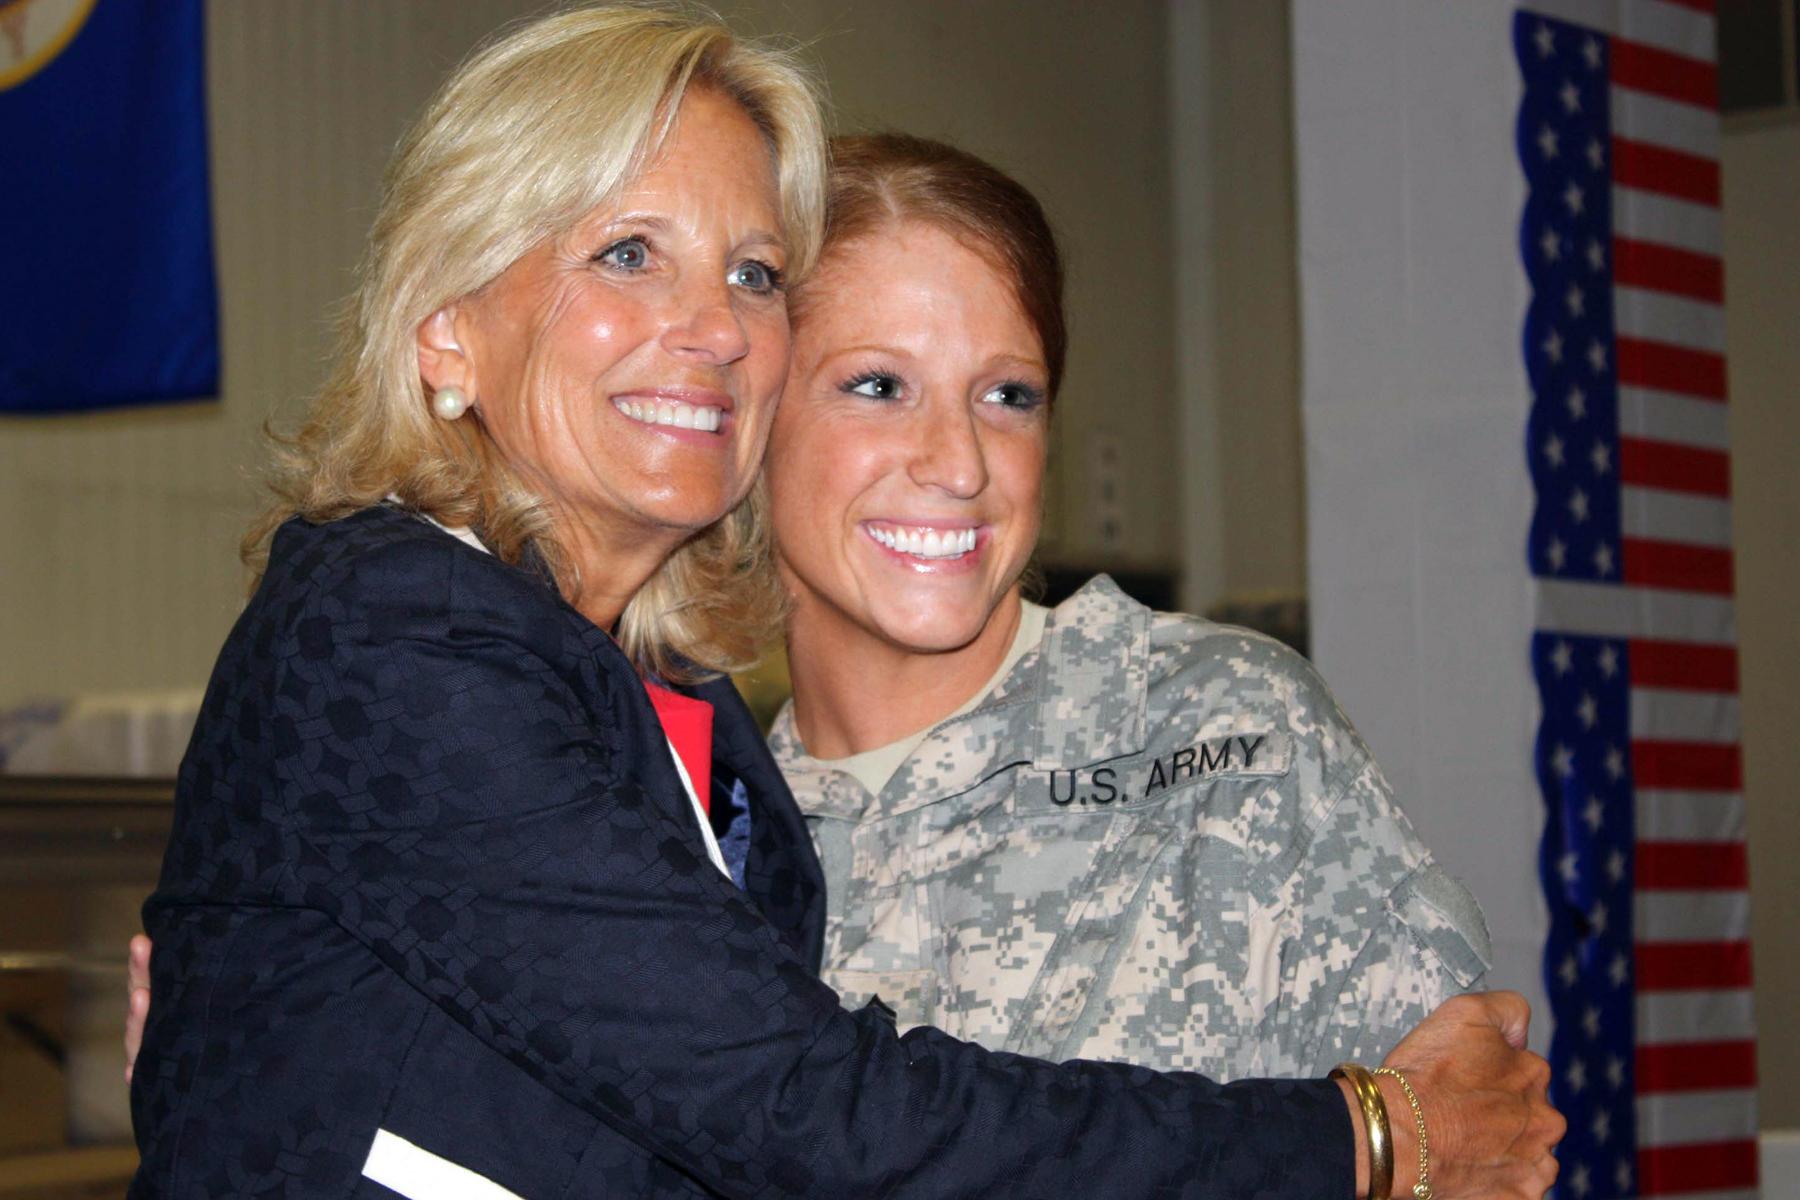 Dr Jill Biden Wife Of Vice President Joe Biden Greets A Soldier At